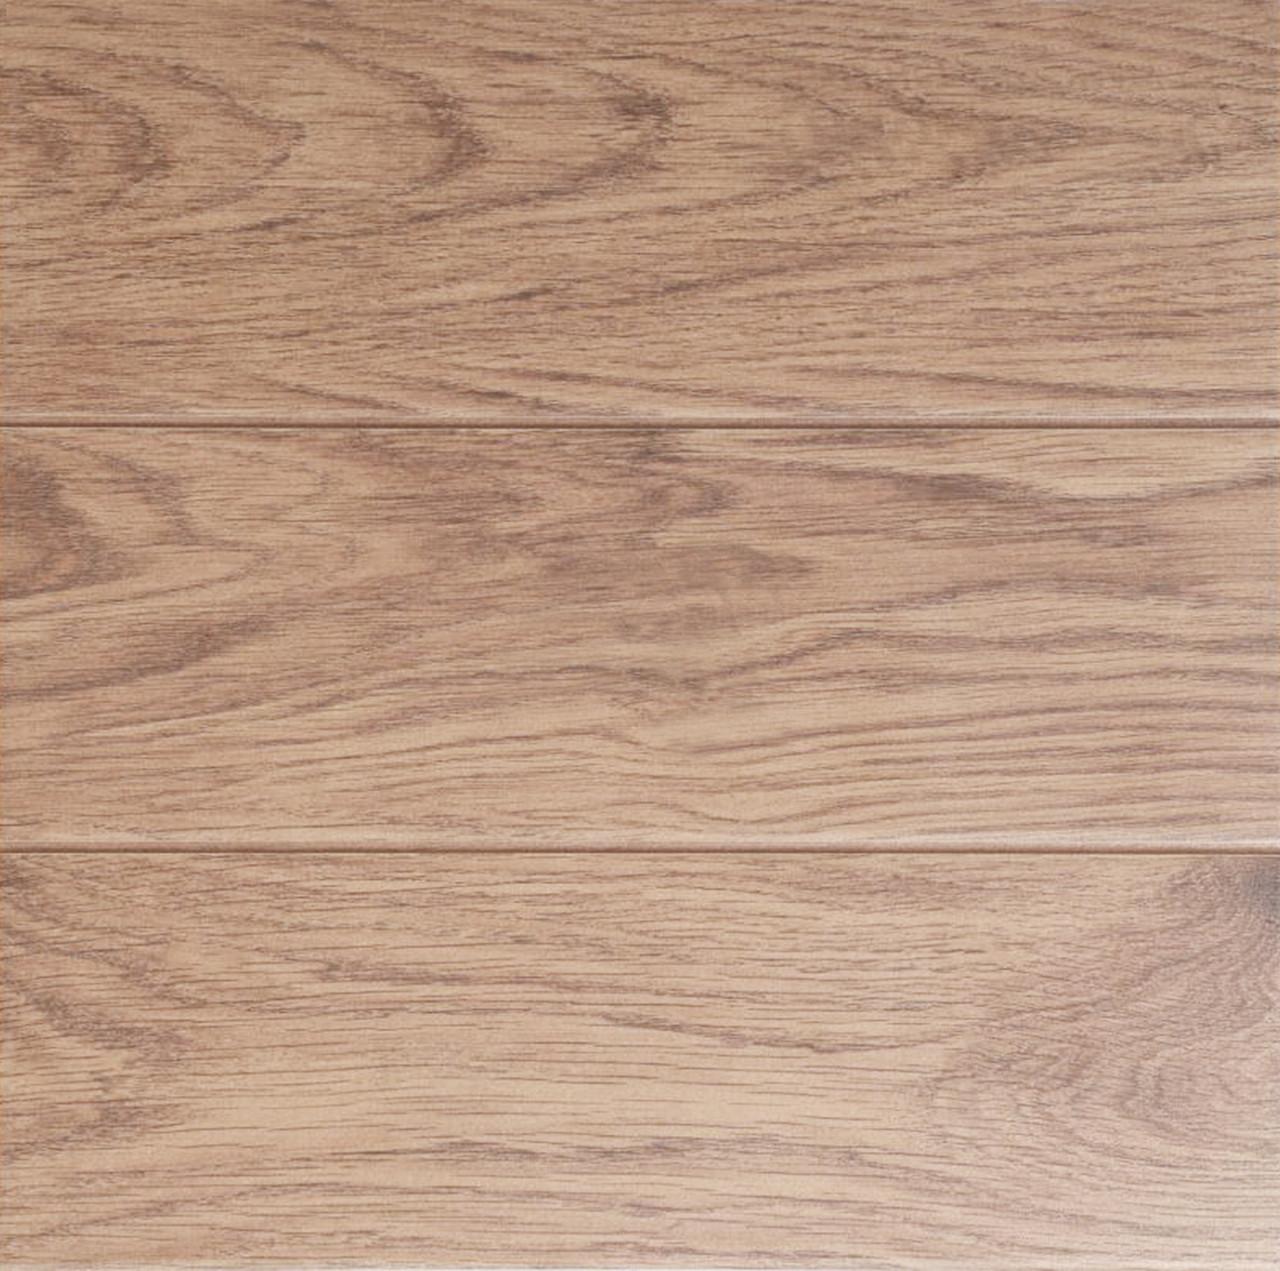 Плитка для пола глазурованная R Tribeka B 400x400 /9